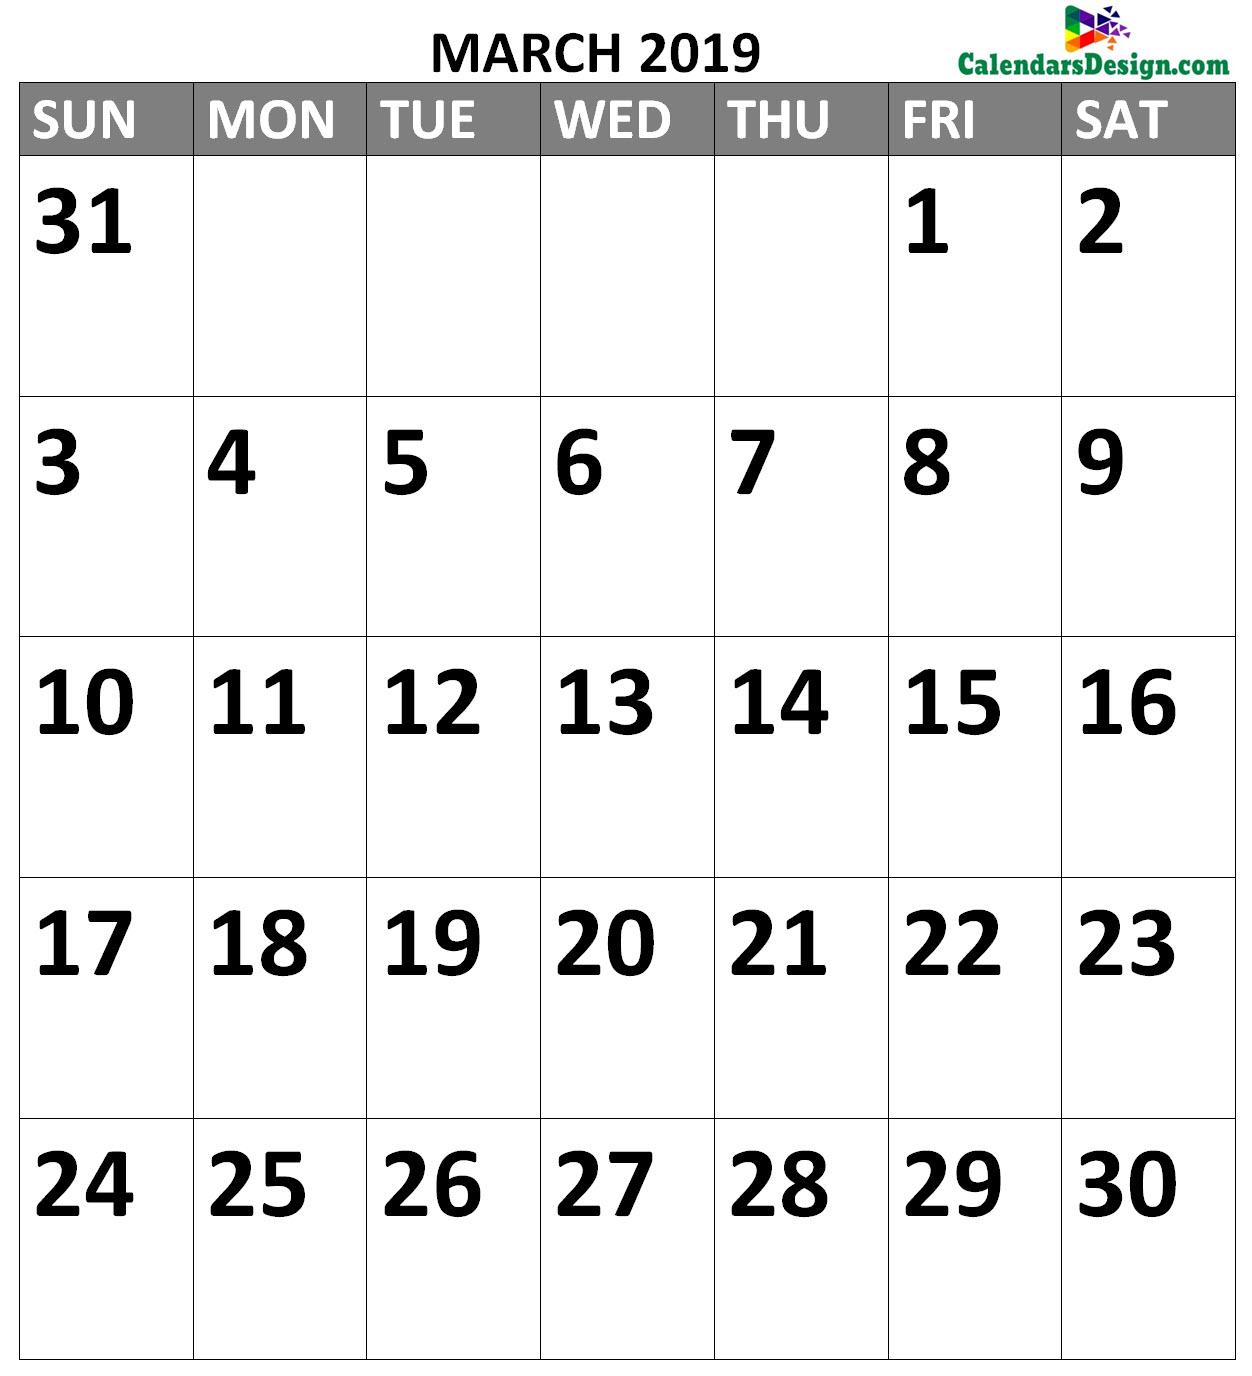 March 2019 Calendar A4 Size